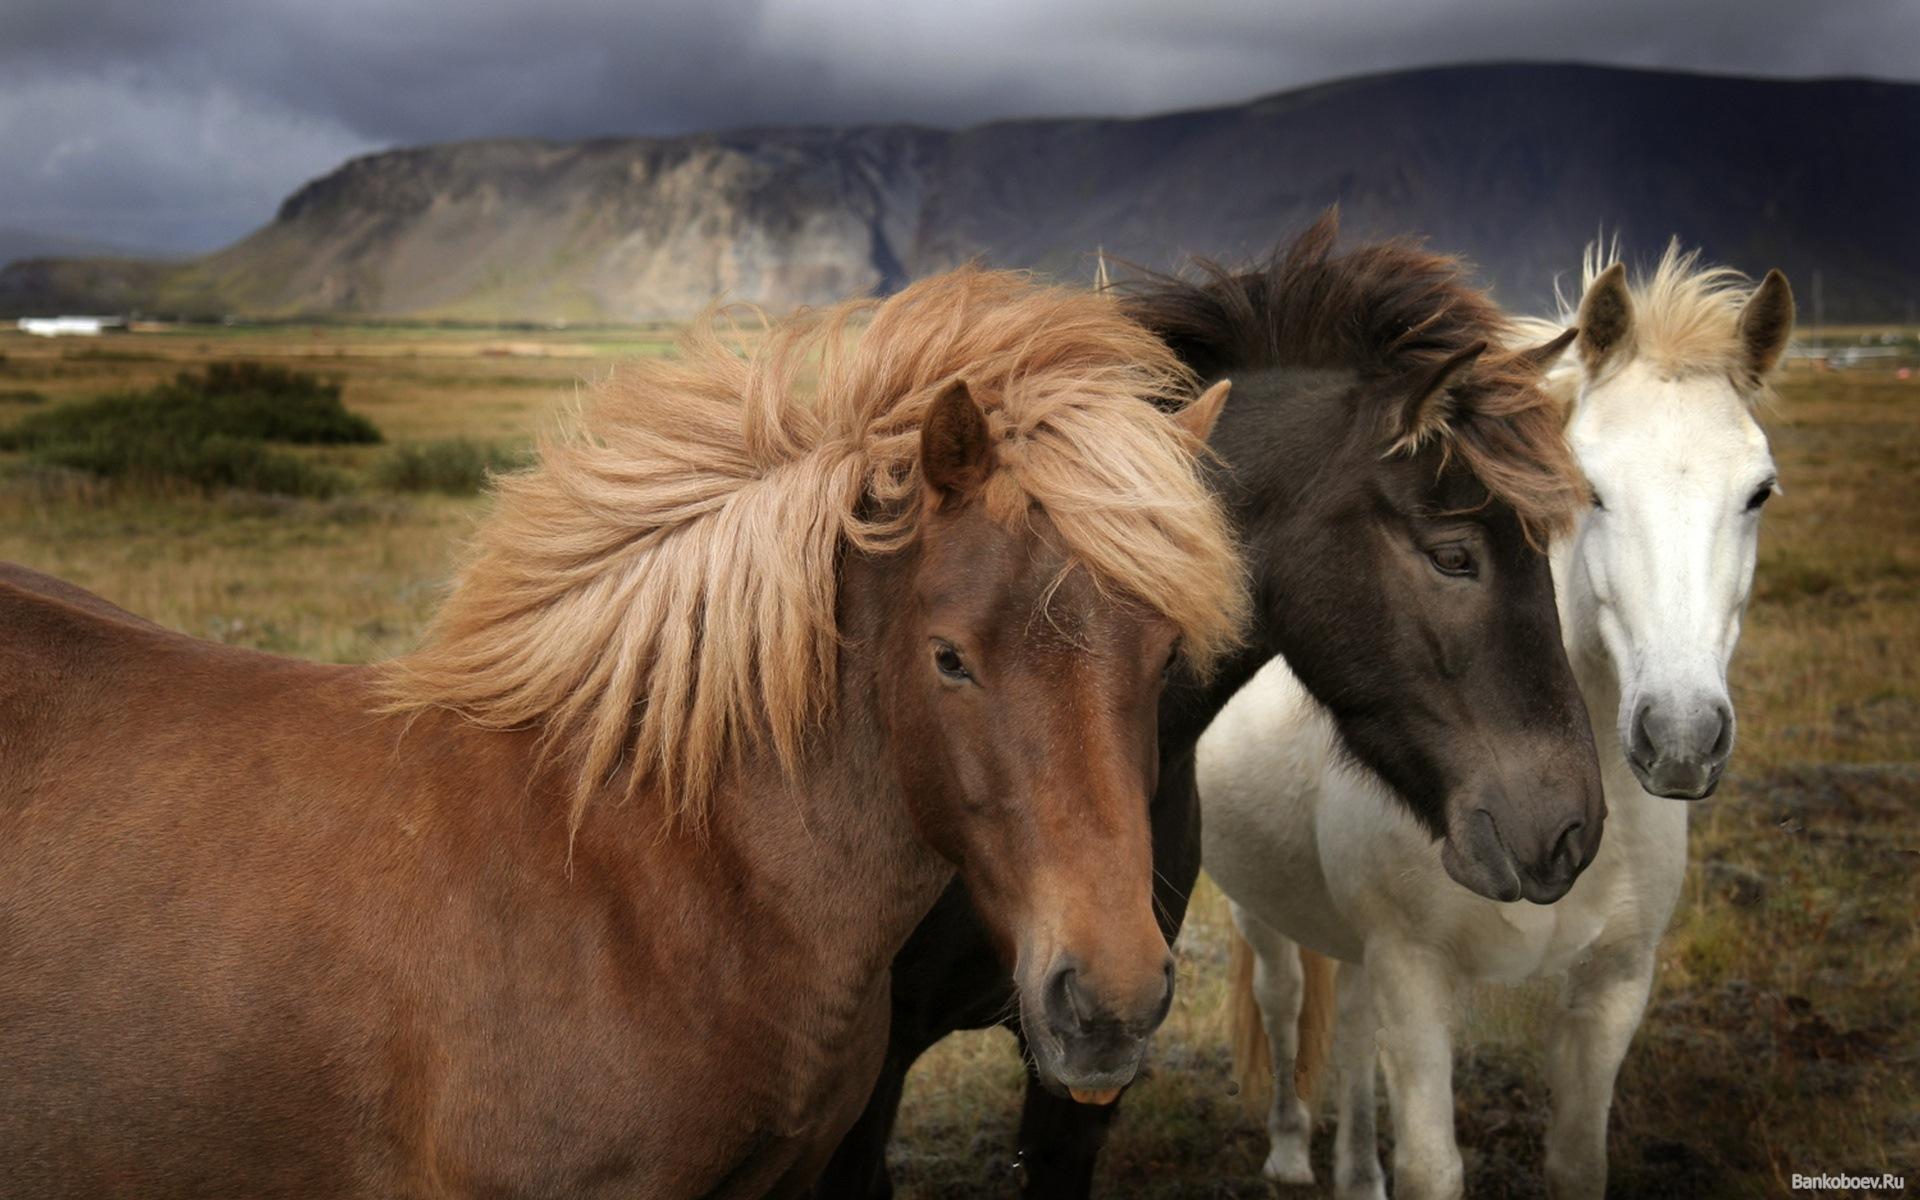 Sfondi desktop hd animali cavalli sfondi hd gratis for Sfondi cavalli gratis